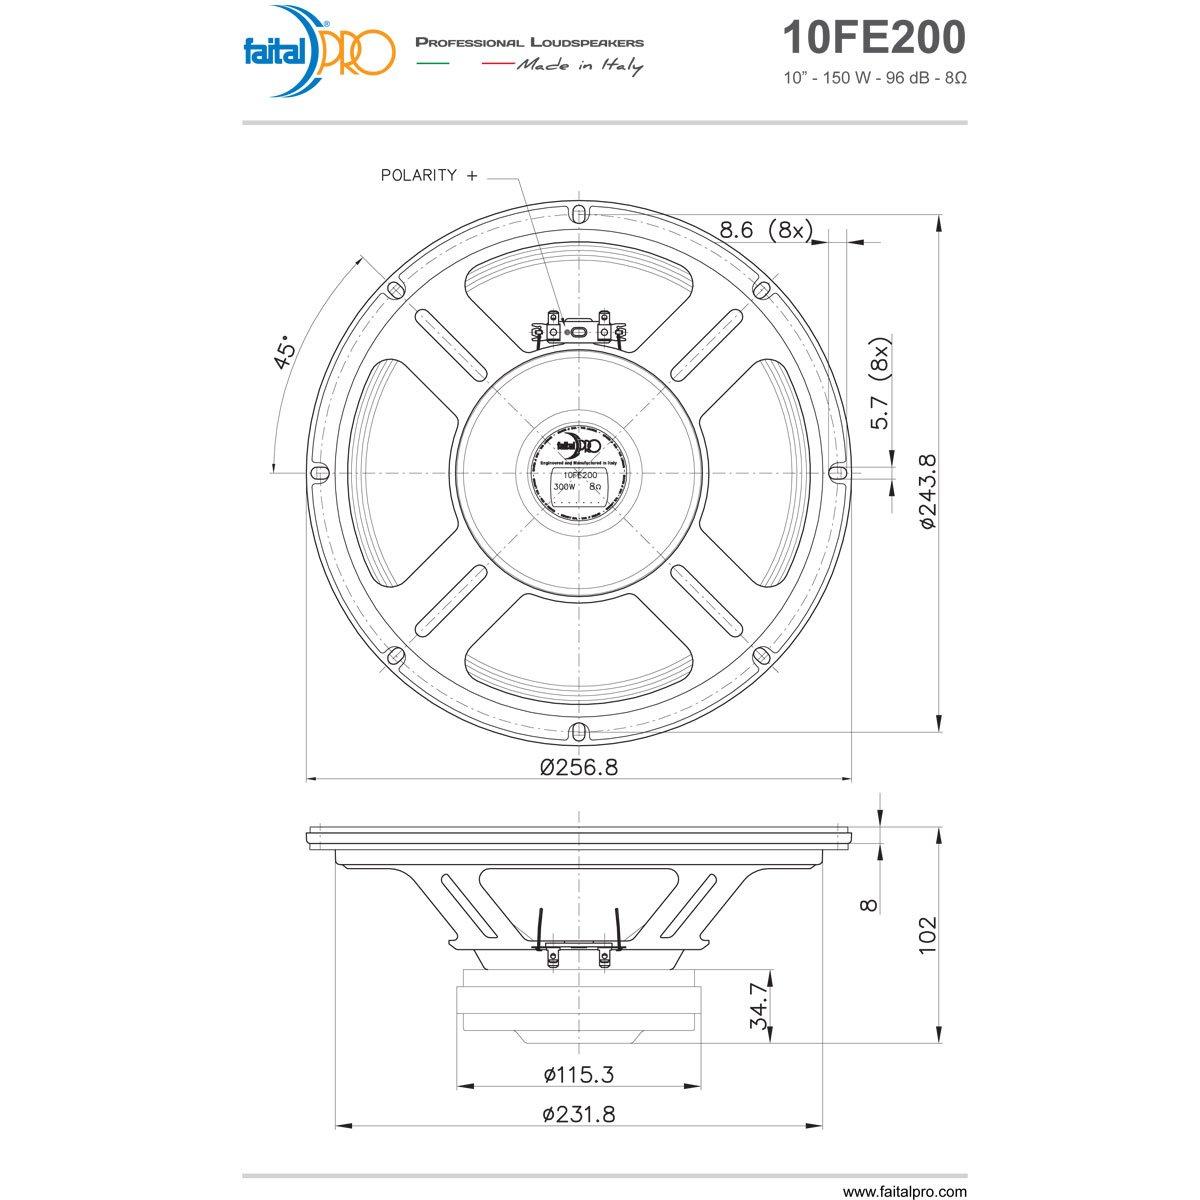 Pair Faital Pro 10fe200 10 Woofer Midrange Open Baffle Rockford Fosgate Punch 45 Specs Speaker 8 Ohm 300w 96db Home Audio Theater